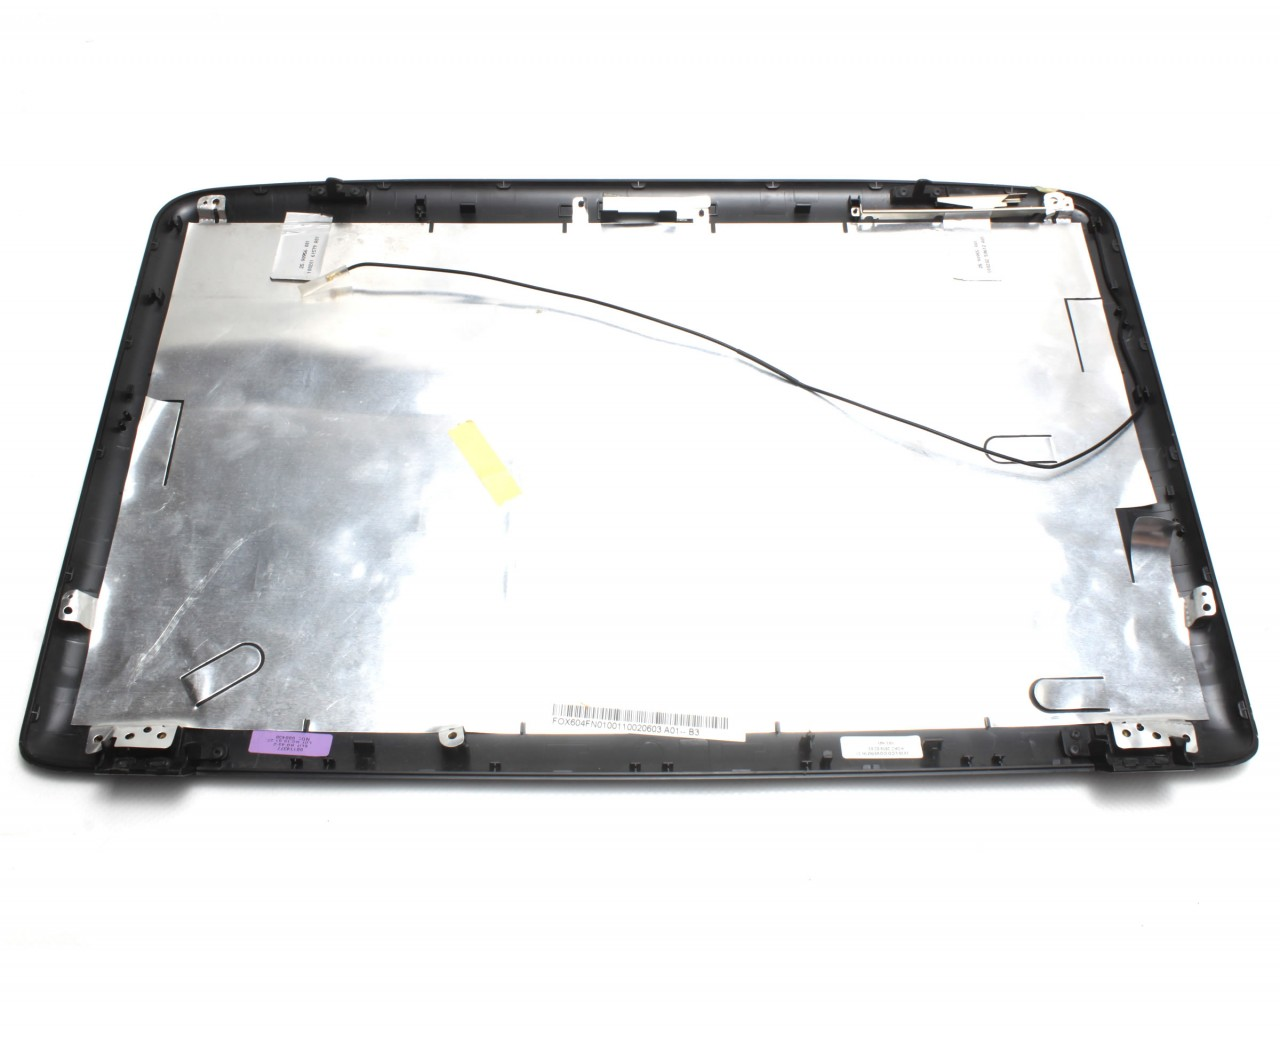 Capac Display BackCover Acer 60 4FN01 001 Carcasa Display imagine